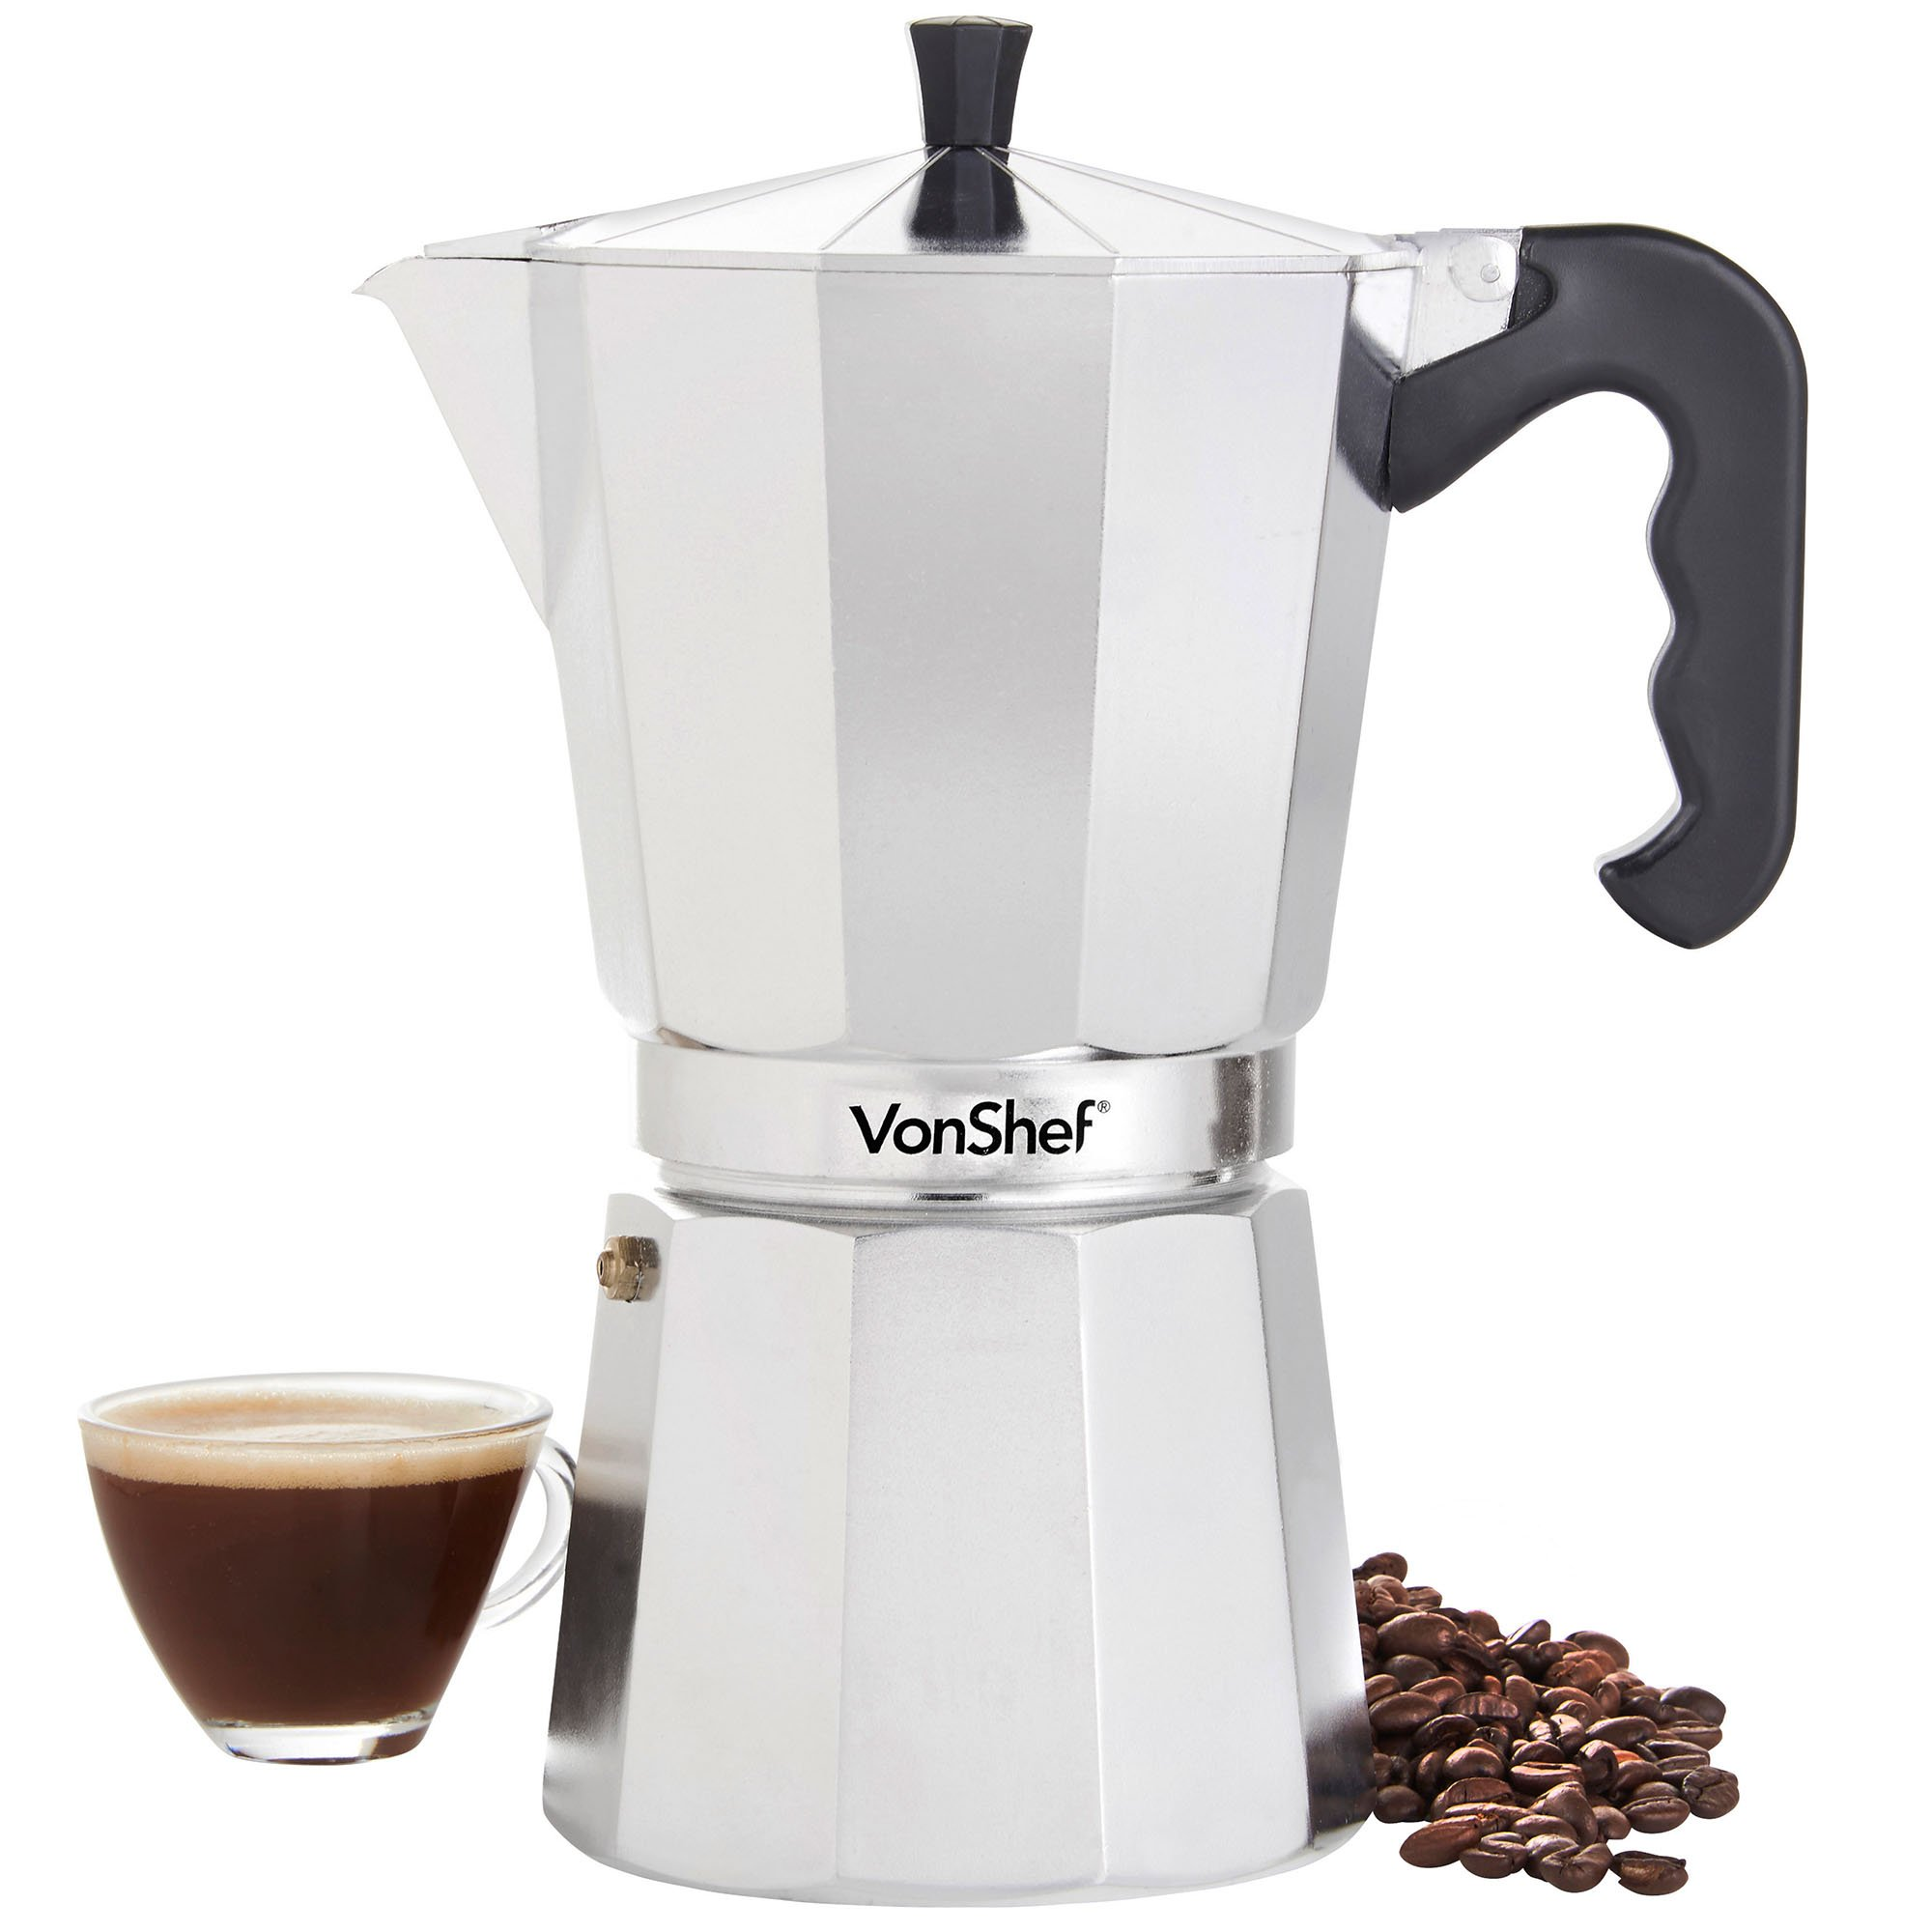 VonShef Cafetera Espresso Italiana Macchinetta Moka de 3/6/9/12 ...